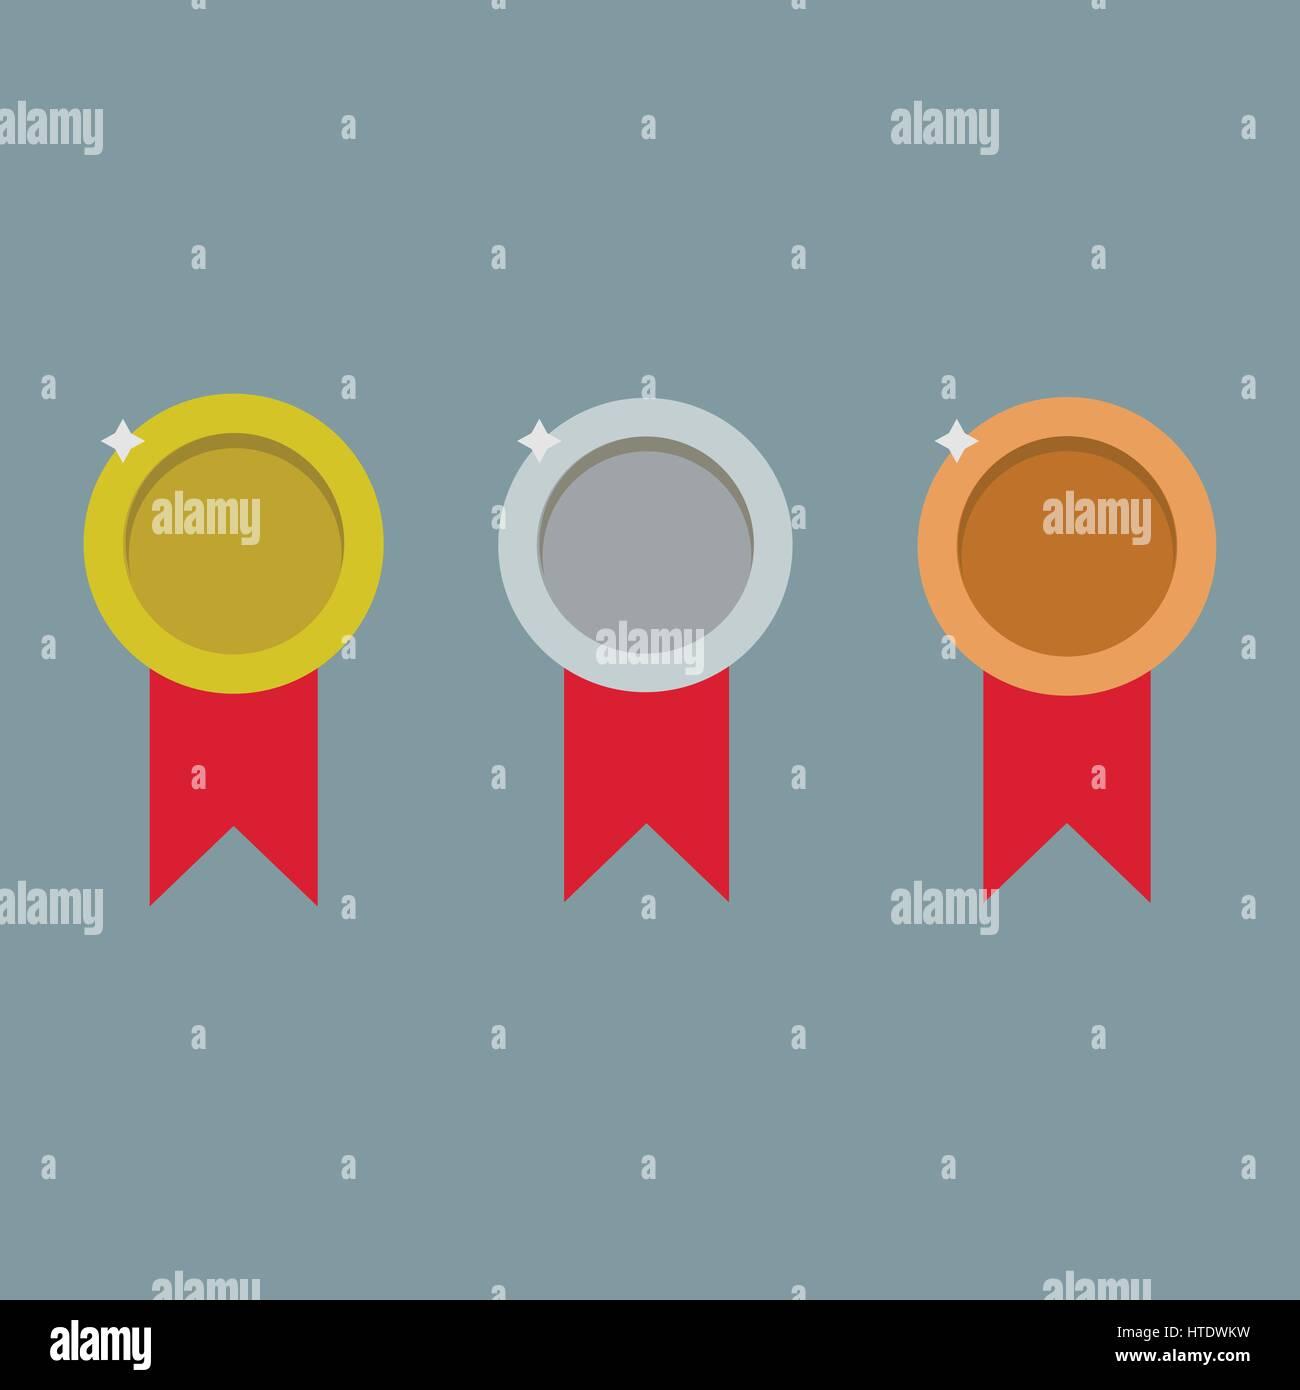 Medals logo illustration - Stock Image